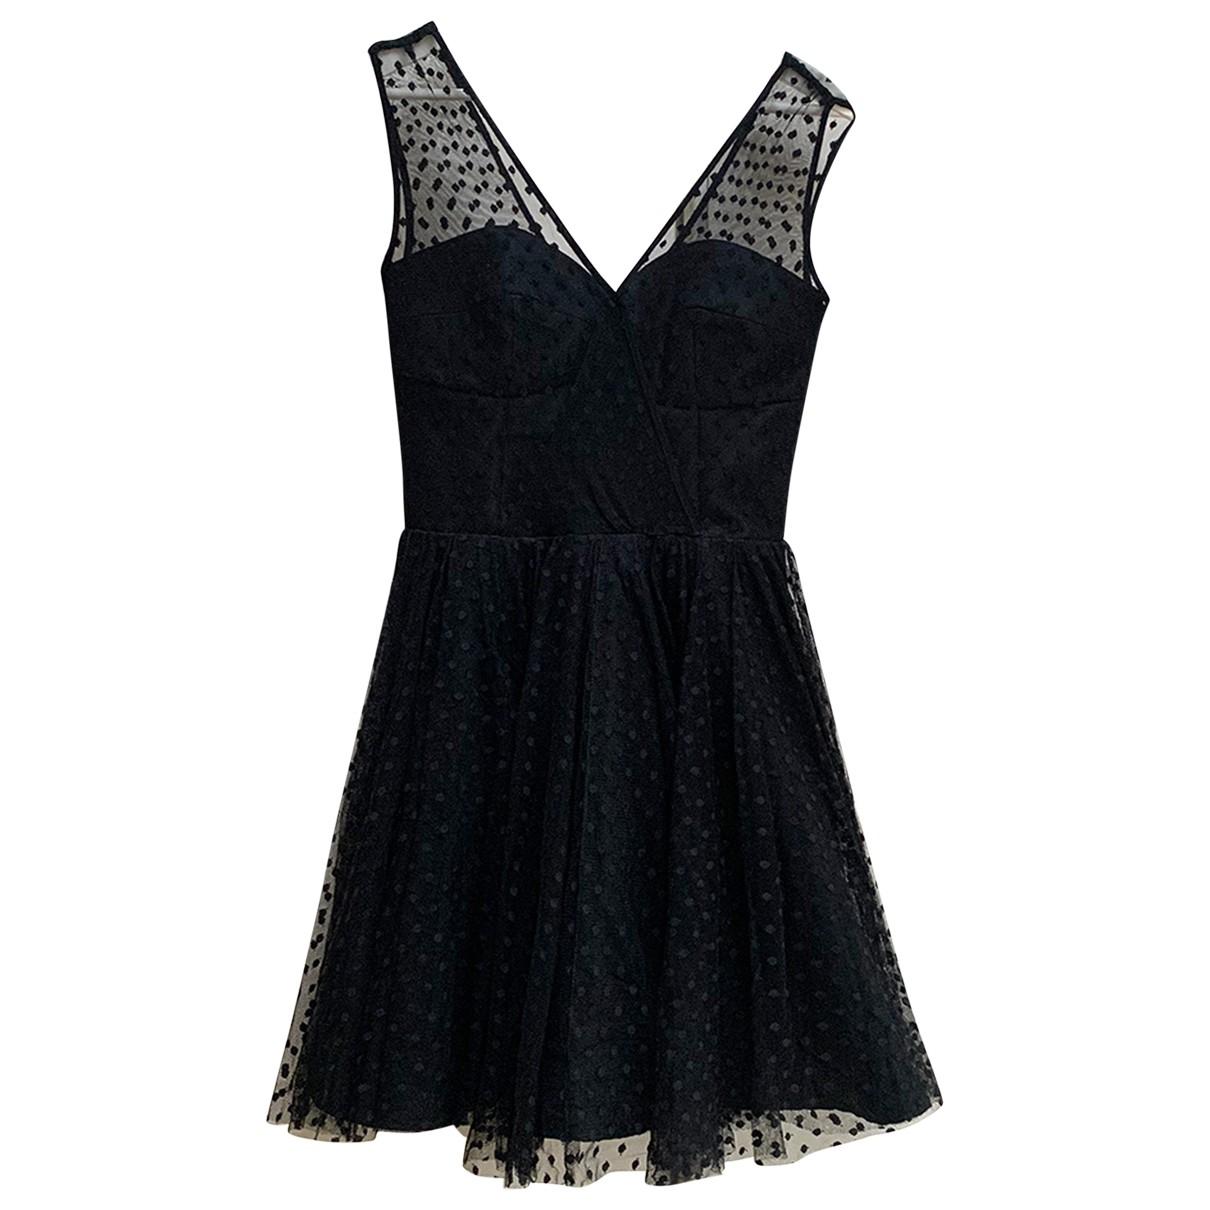 Milly \N Black dress for Women 6 US